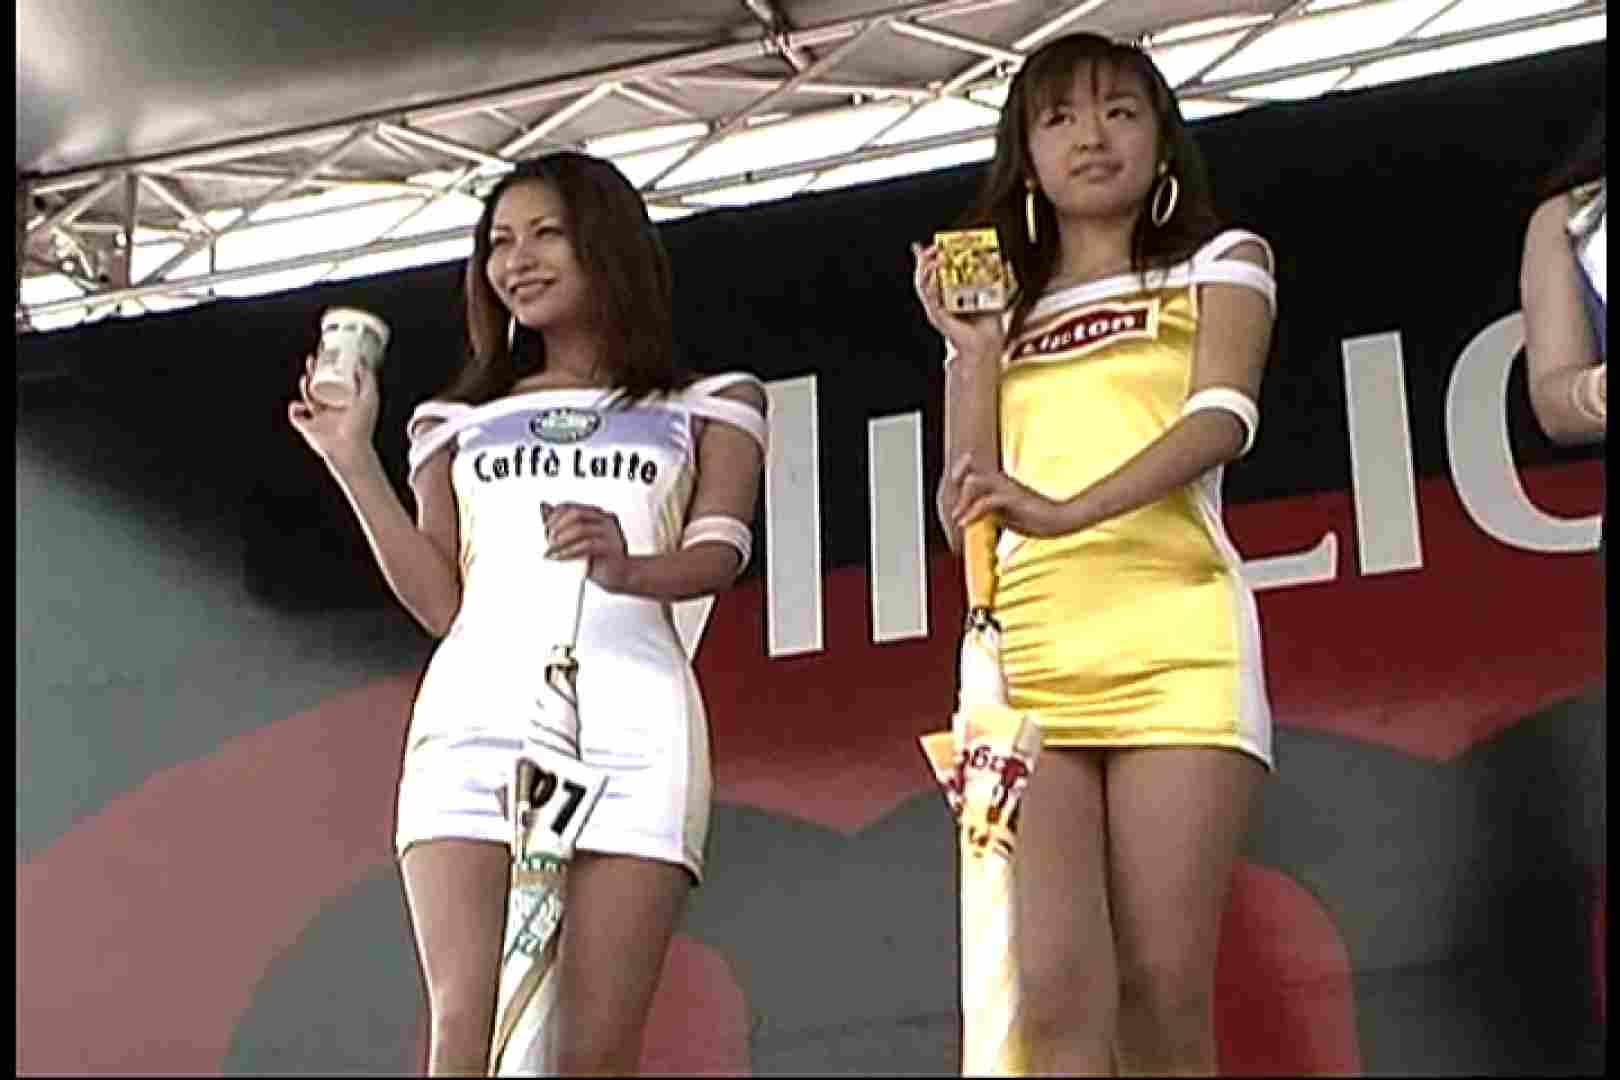 RQカメラ地獄Vol.6 美女OL  45連発 4